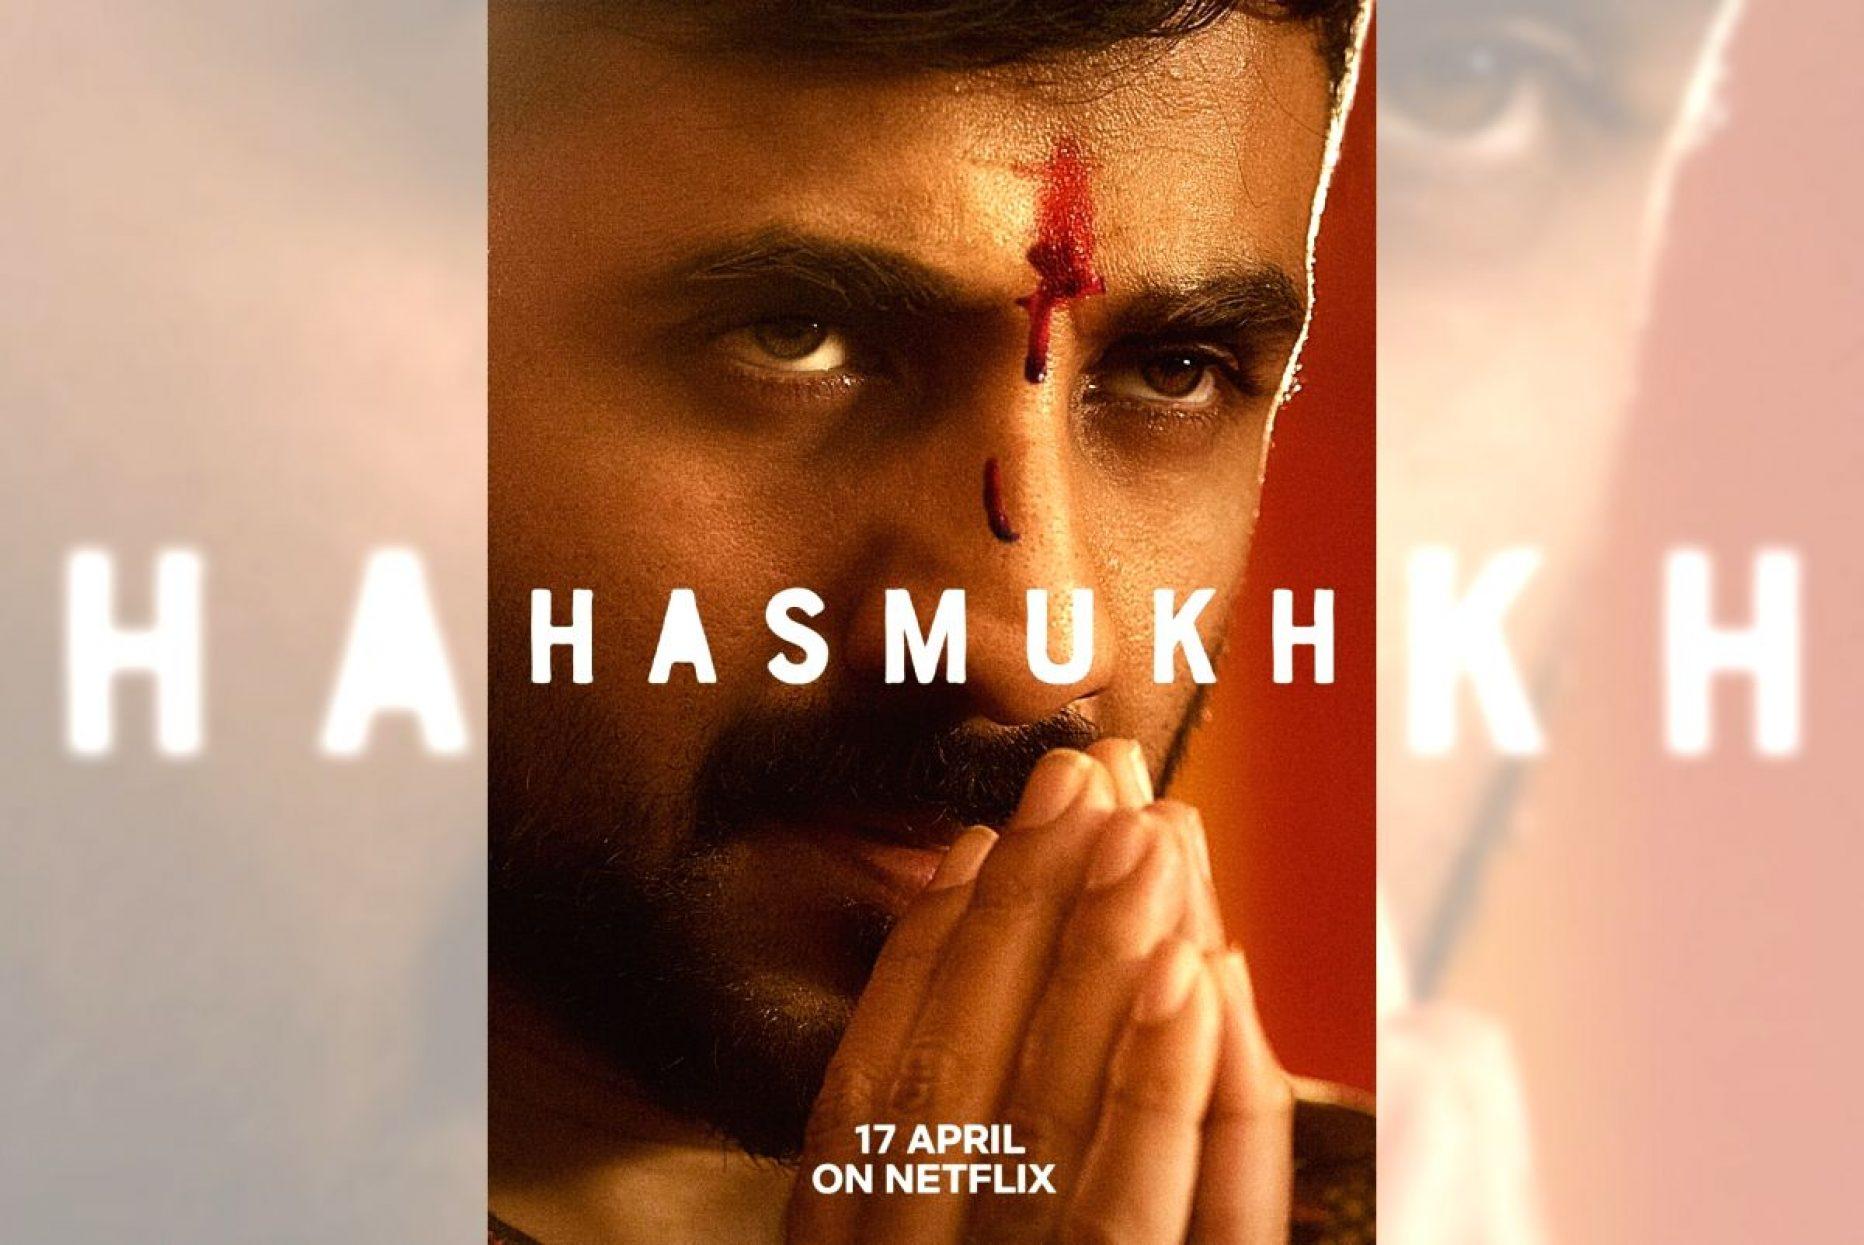 Netflix Hasmukh Season 2 Release Date, Cast, Trailer, Plot, Story